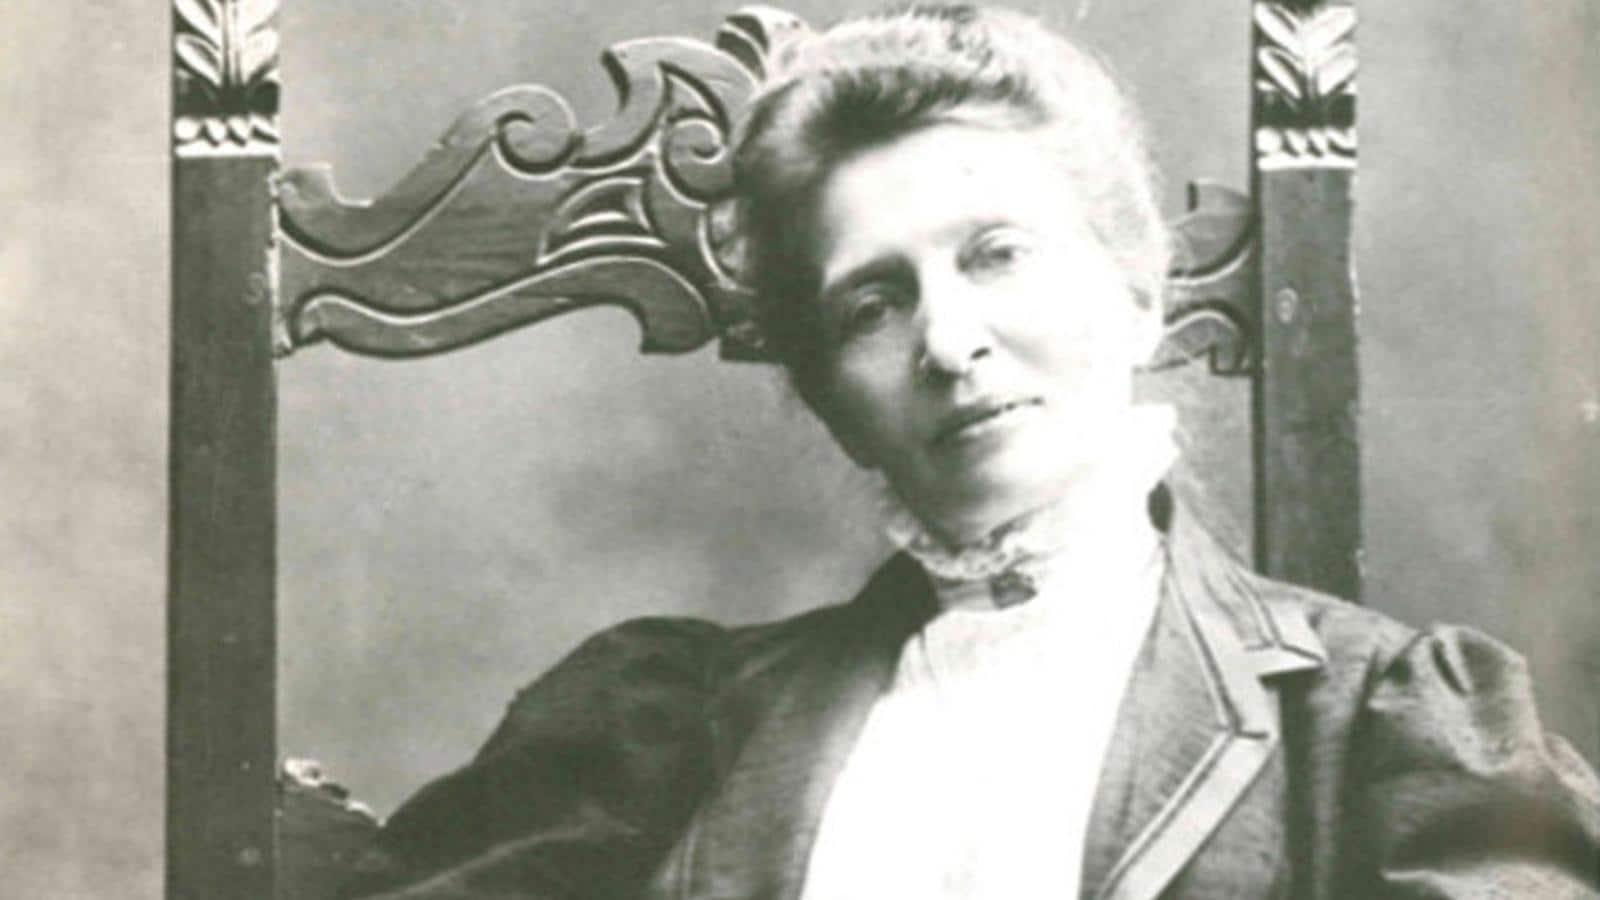 Insolite ignote: Anna Kuliscioff